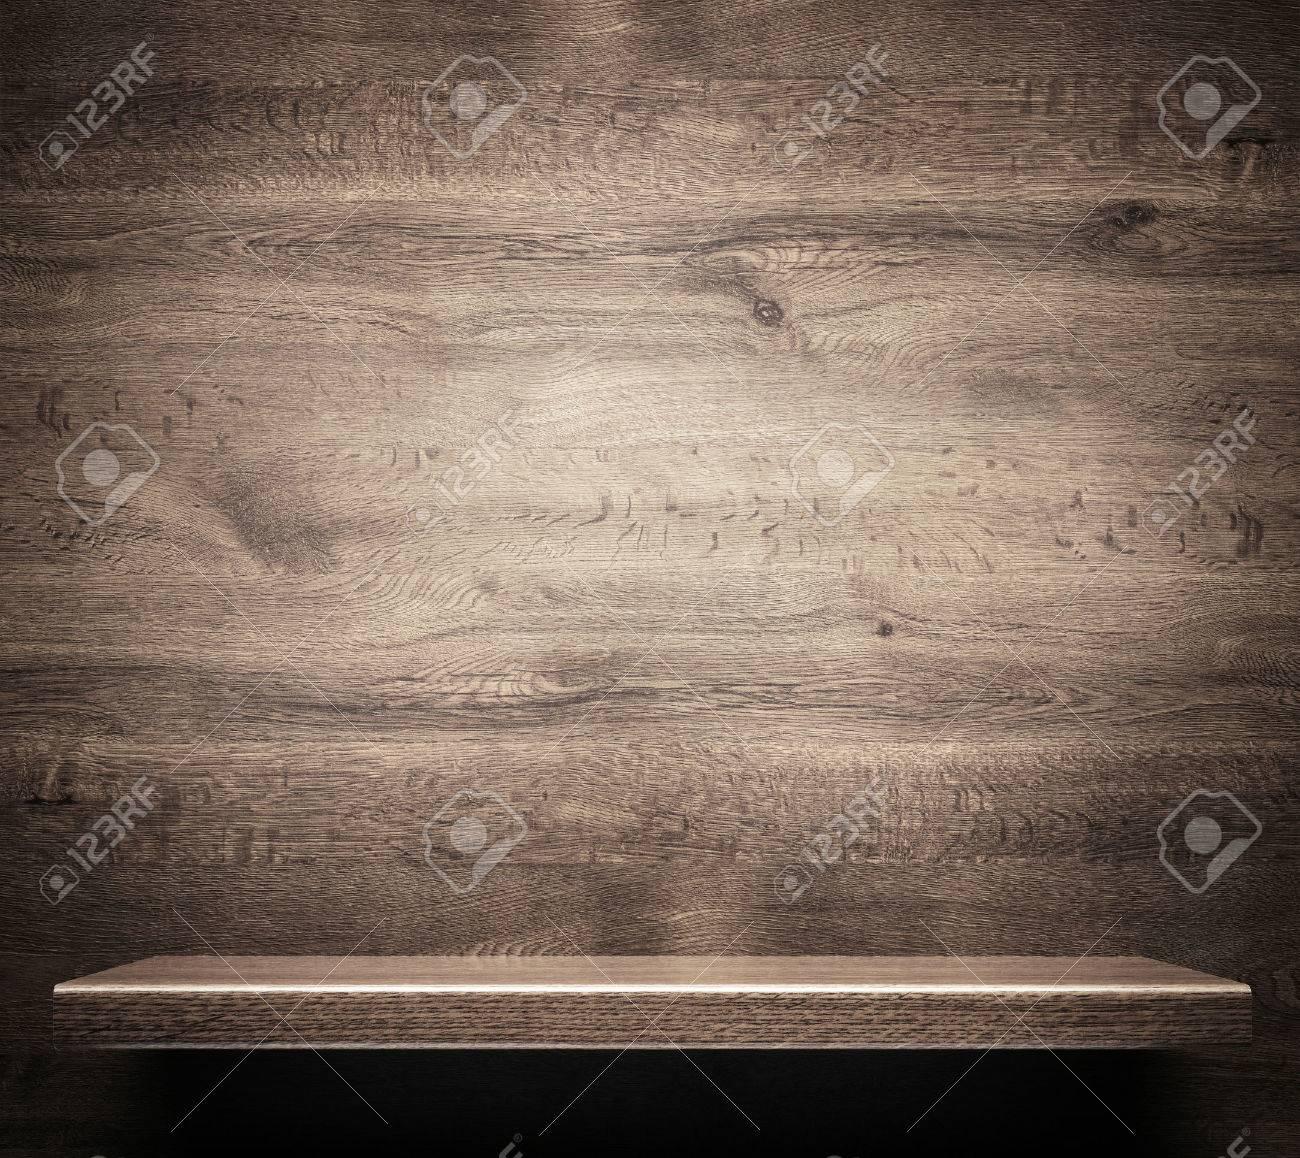 Wooden shelf Stock Photo - 30409746